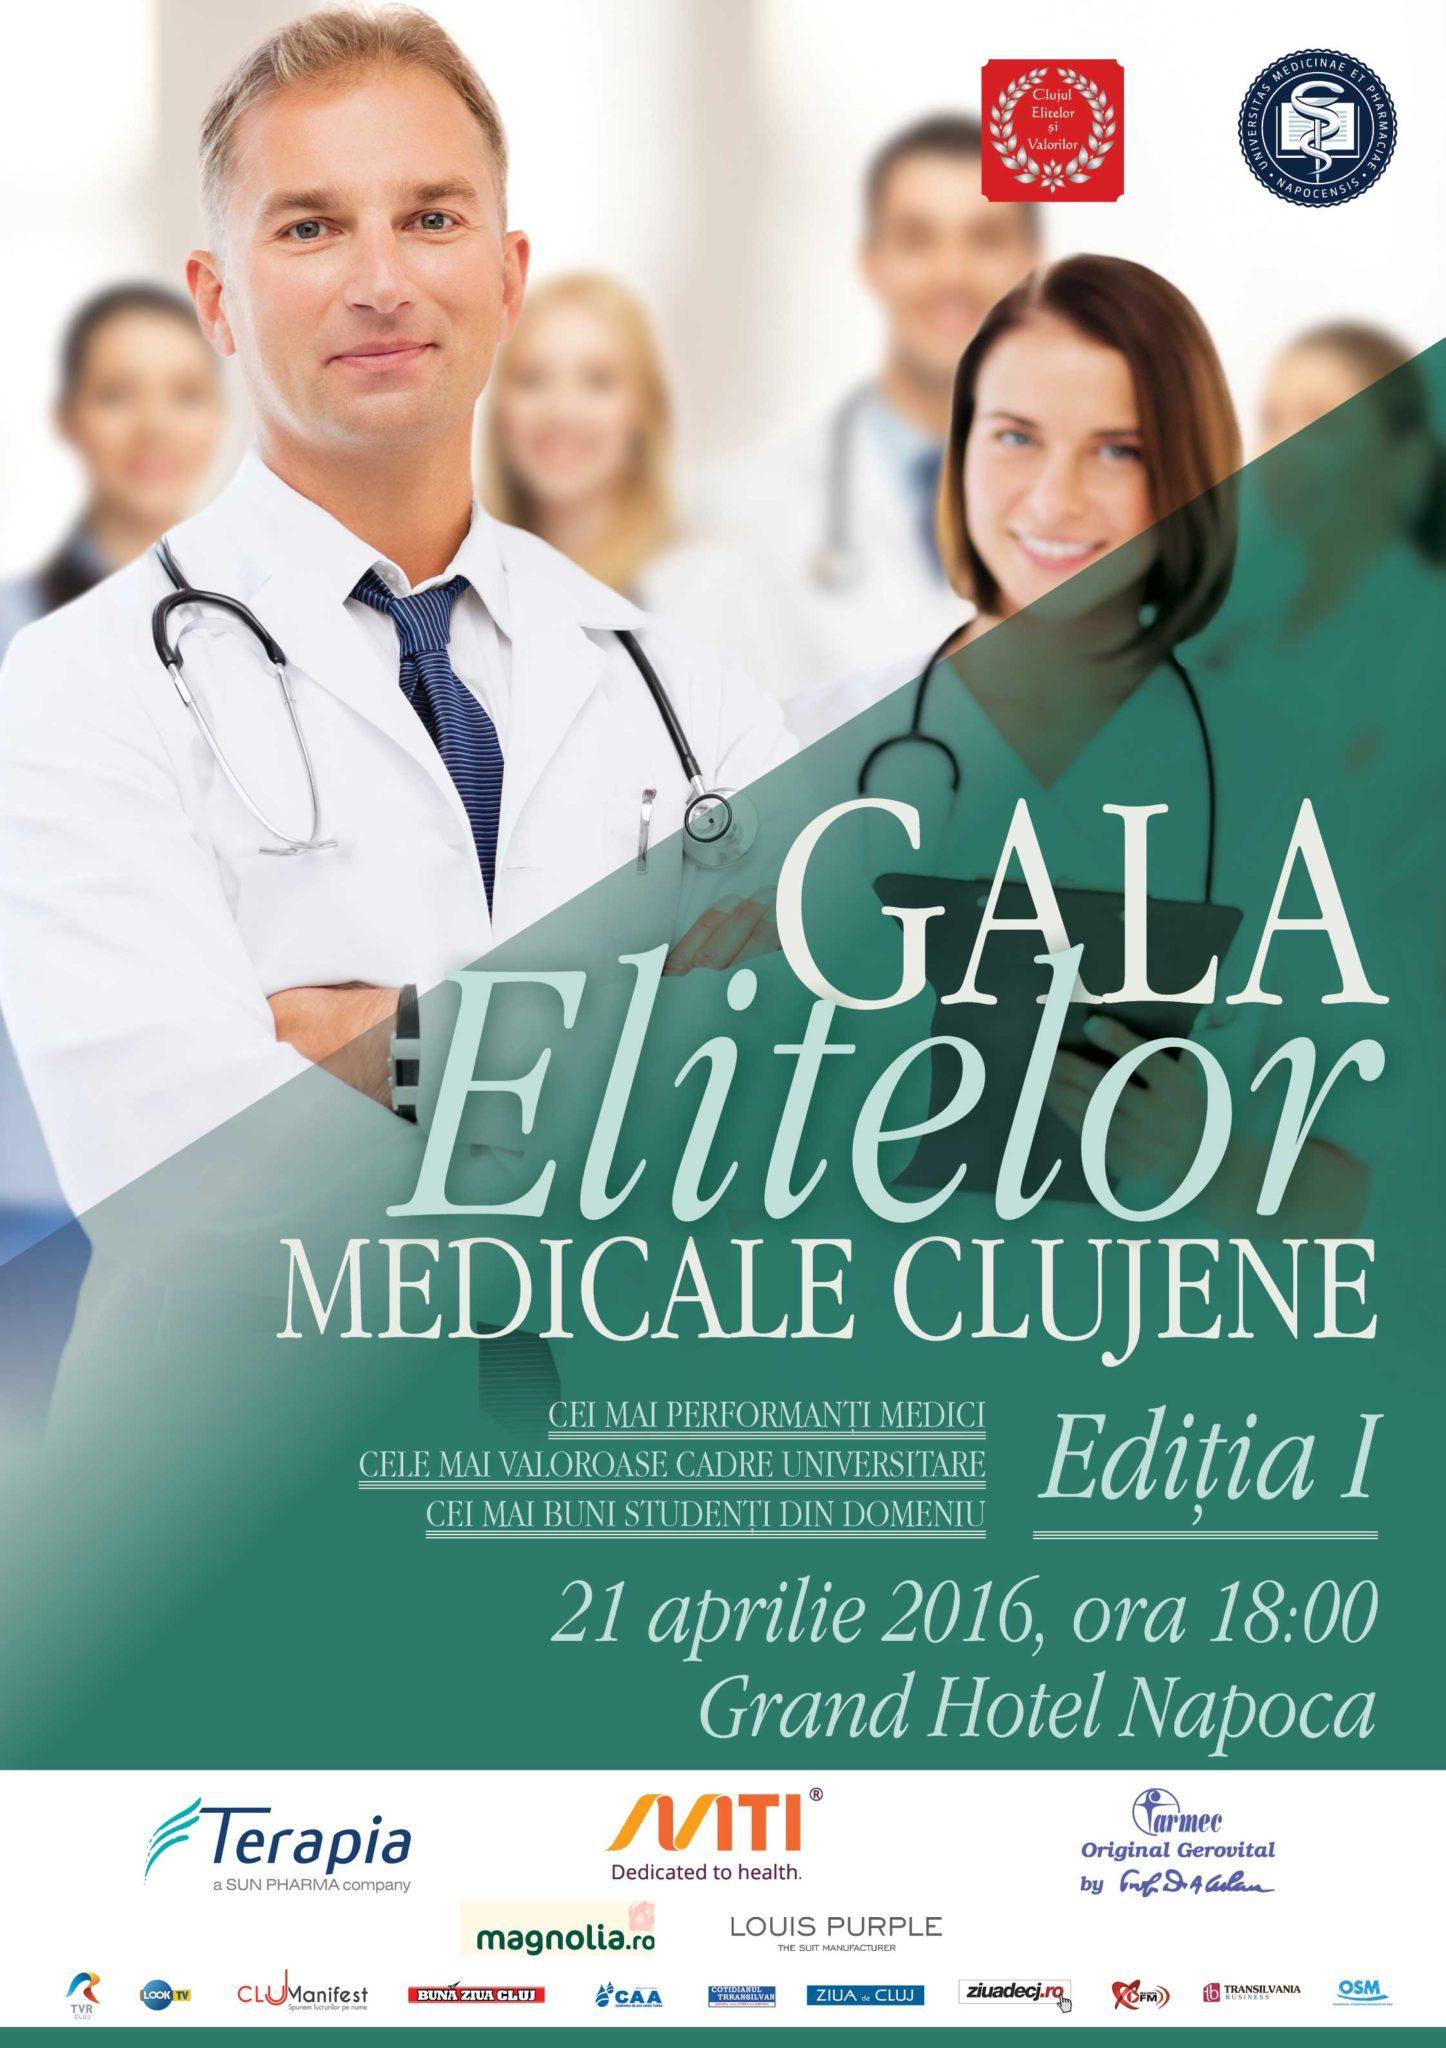 gala-elitelor-medicale-clujene